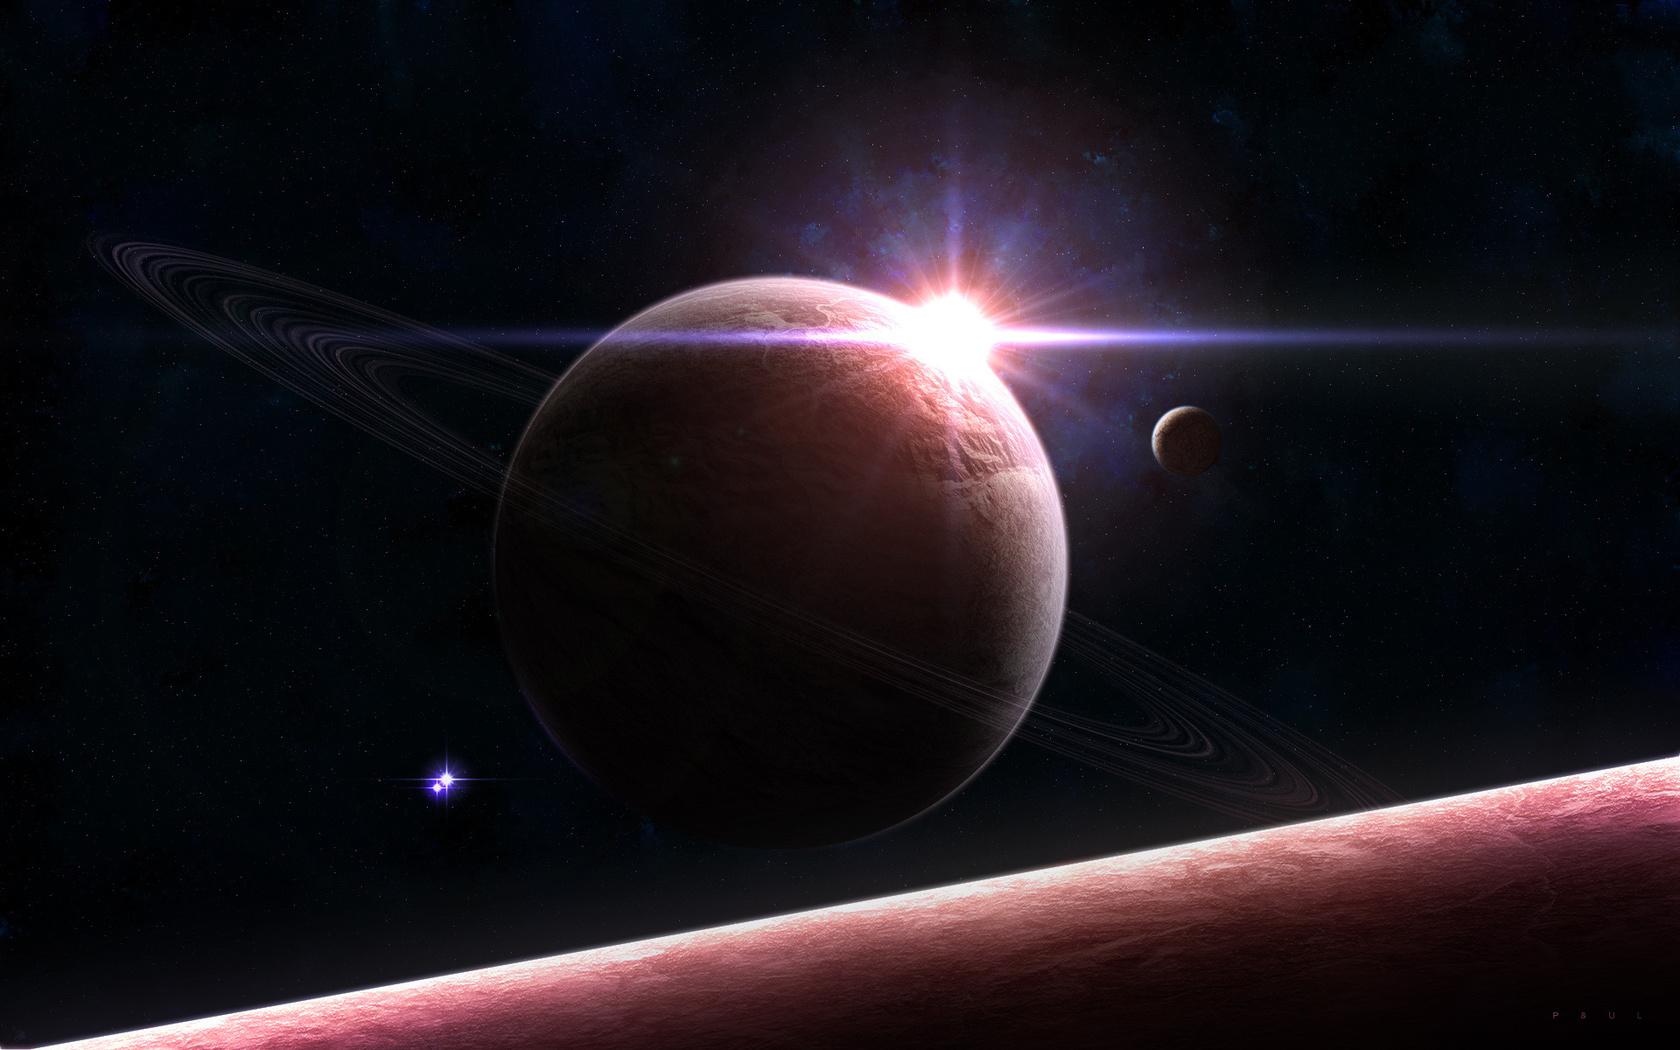 Солнце, кольца, свет, планета